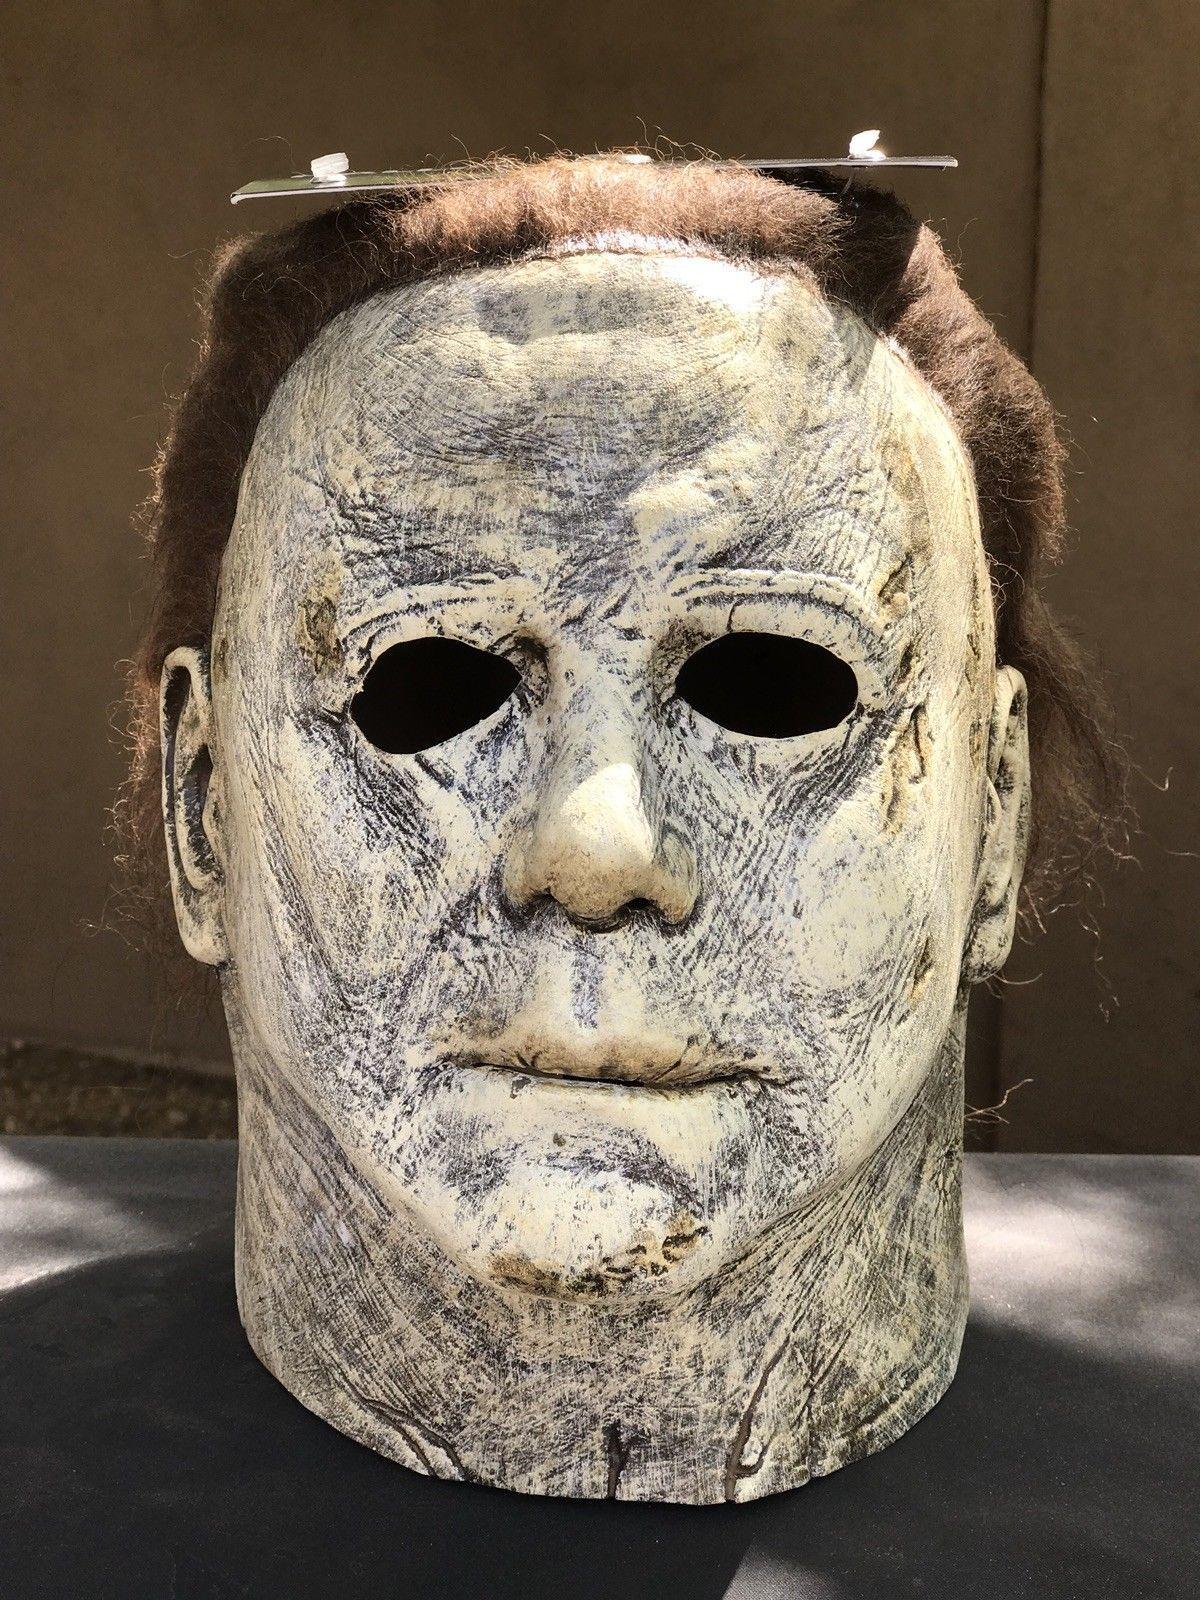 2017 TV The Trick Mask Cosplay Trick Mask Halloween Latex Helmet Prop Handmade